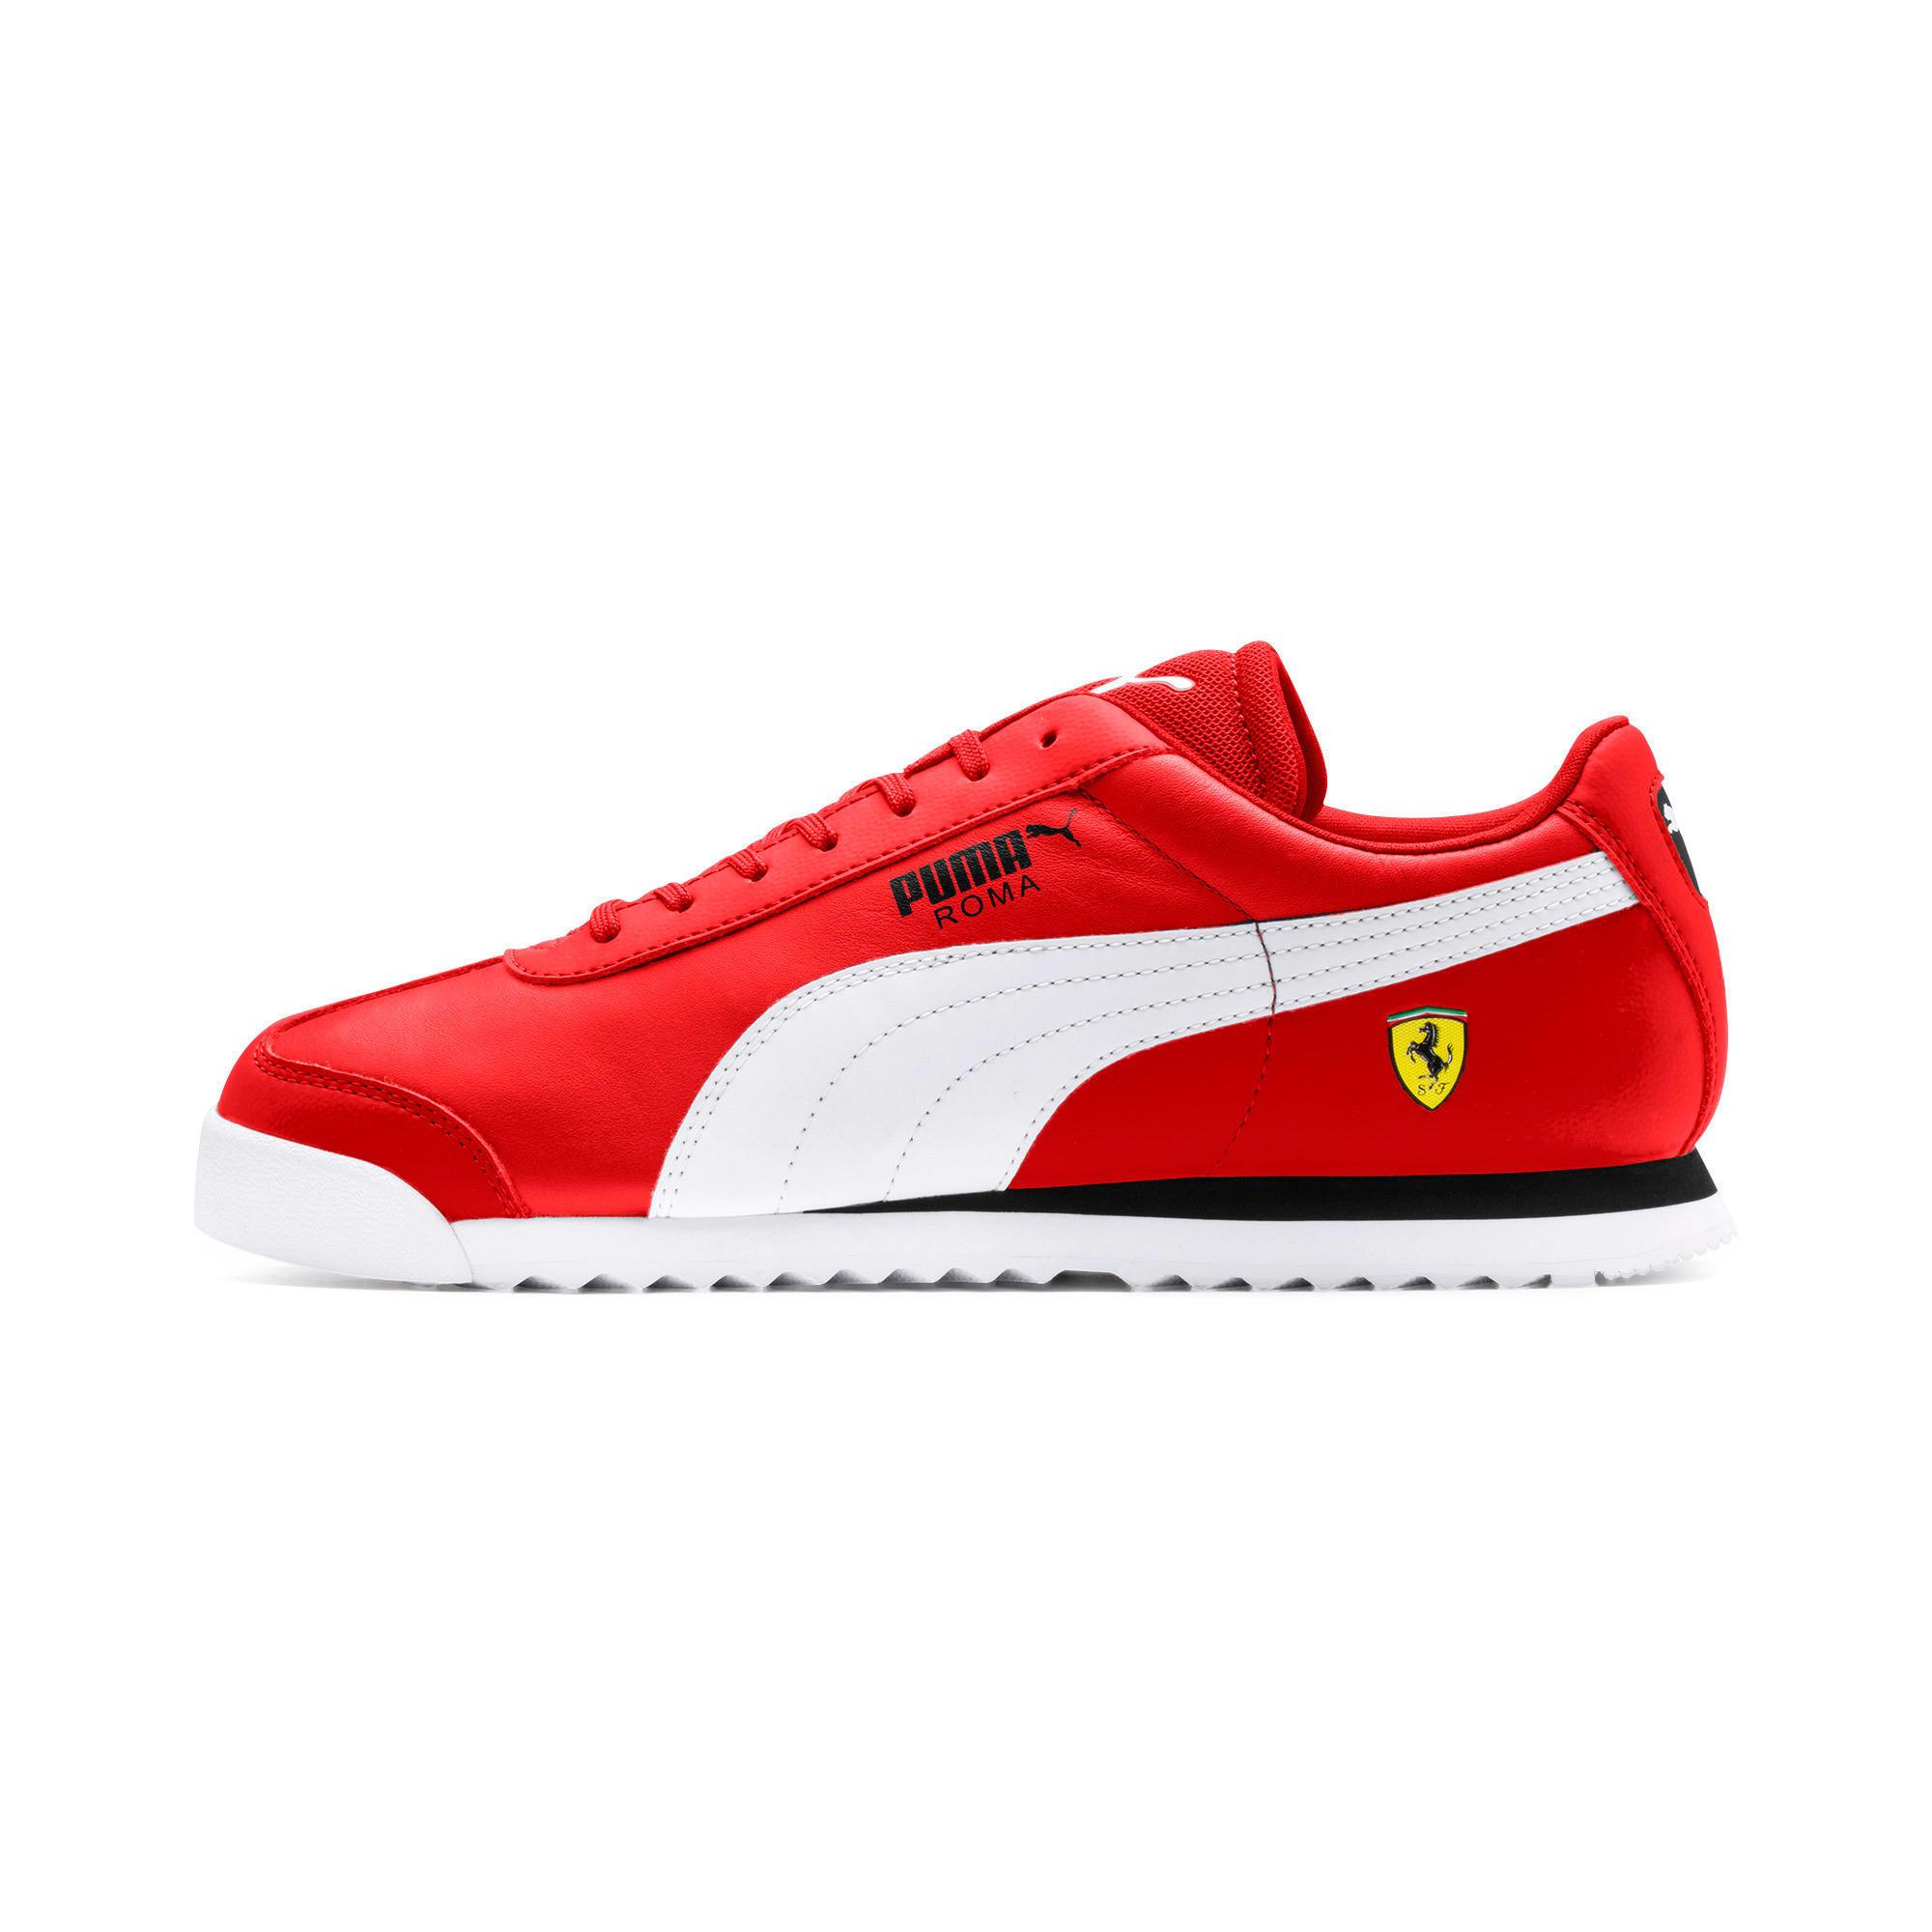 Miniatura 1 de Zapatos deportivos Scuderia Ferrari Roma para hombre, Rosso Corsa-White-Black, mediano